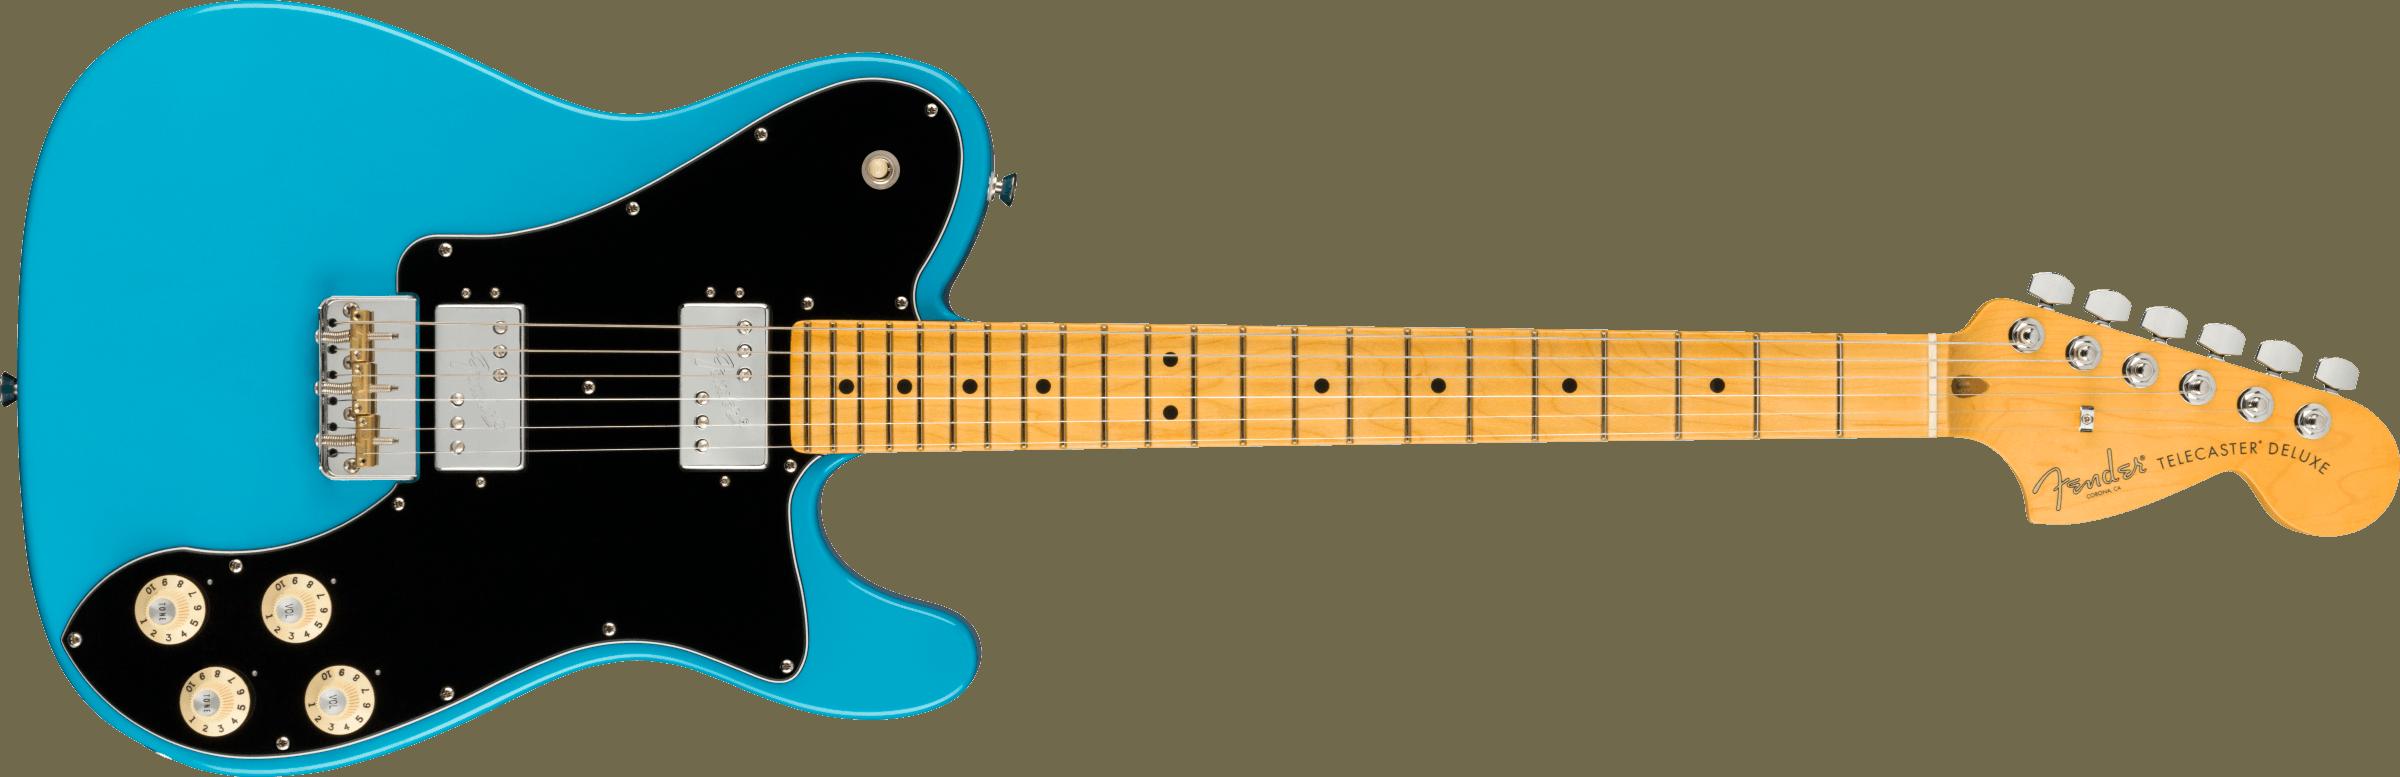 FENDER-American-Professional-II-Telecaster-Deluxe-Maple-Fingerboard-Miami-Blue-sku-571005264